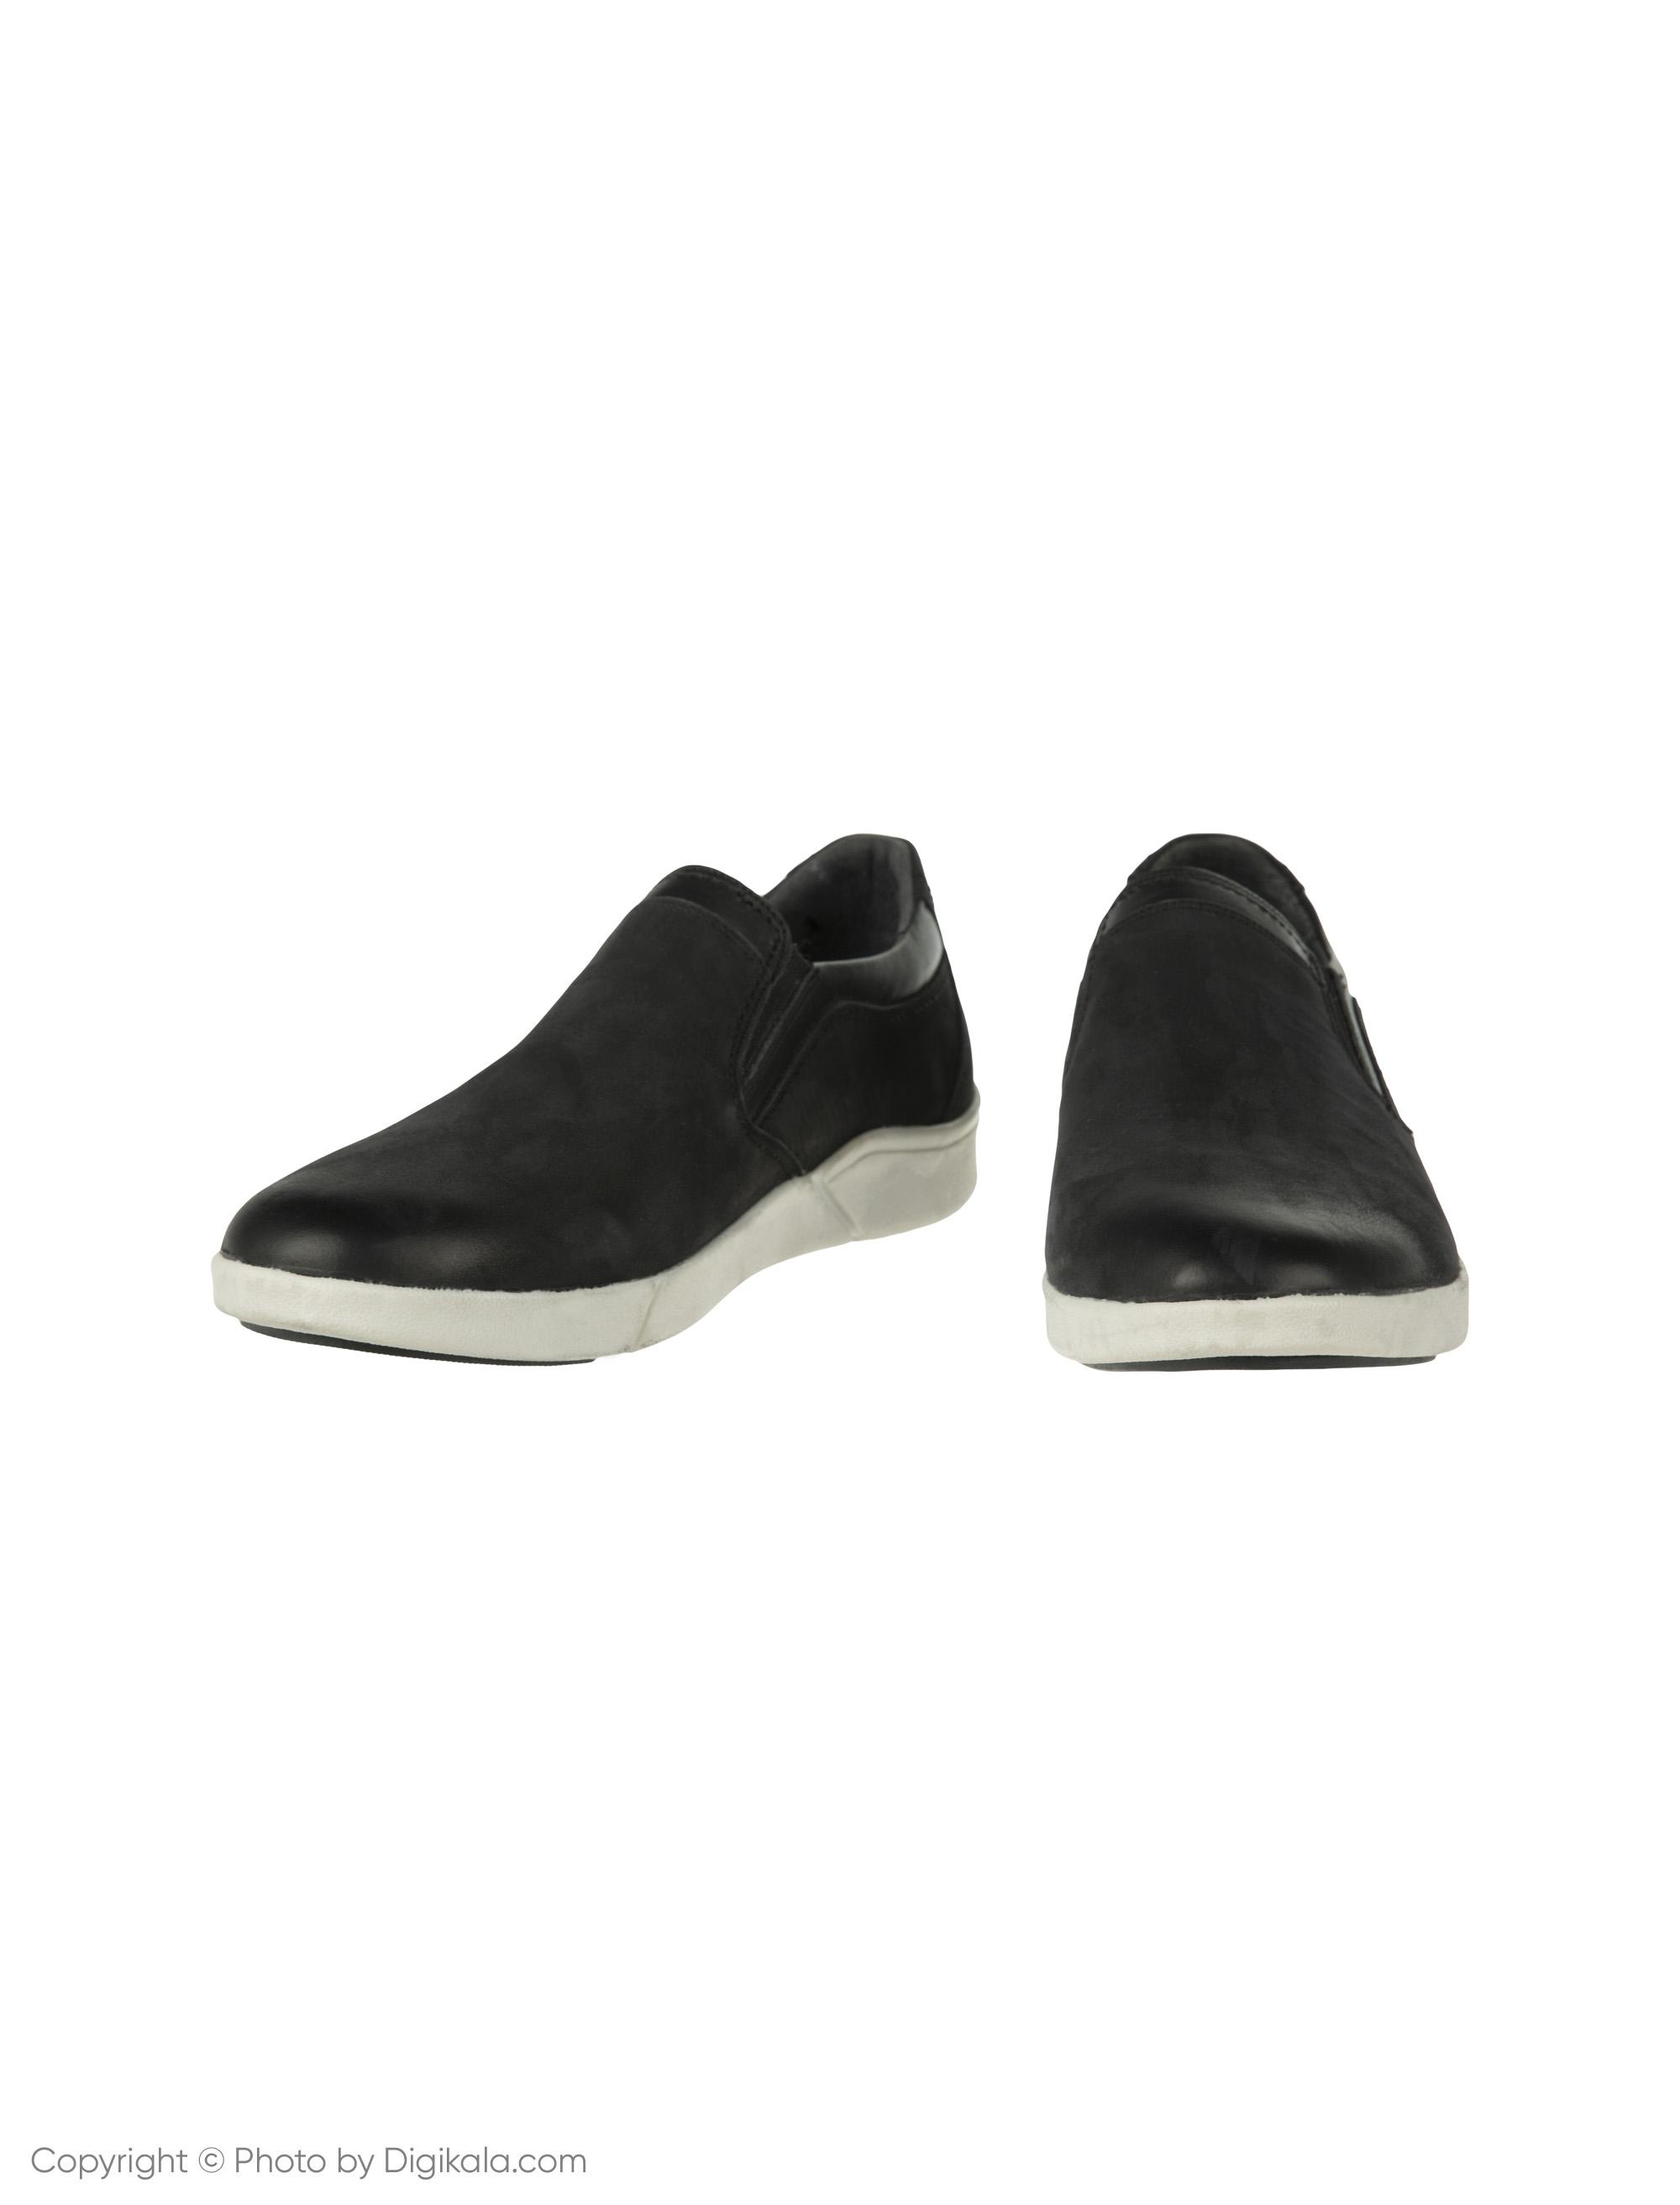 کفش روزمره مردانه ساتین مدل SN7178A-101 -  - 3